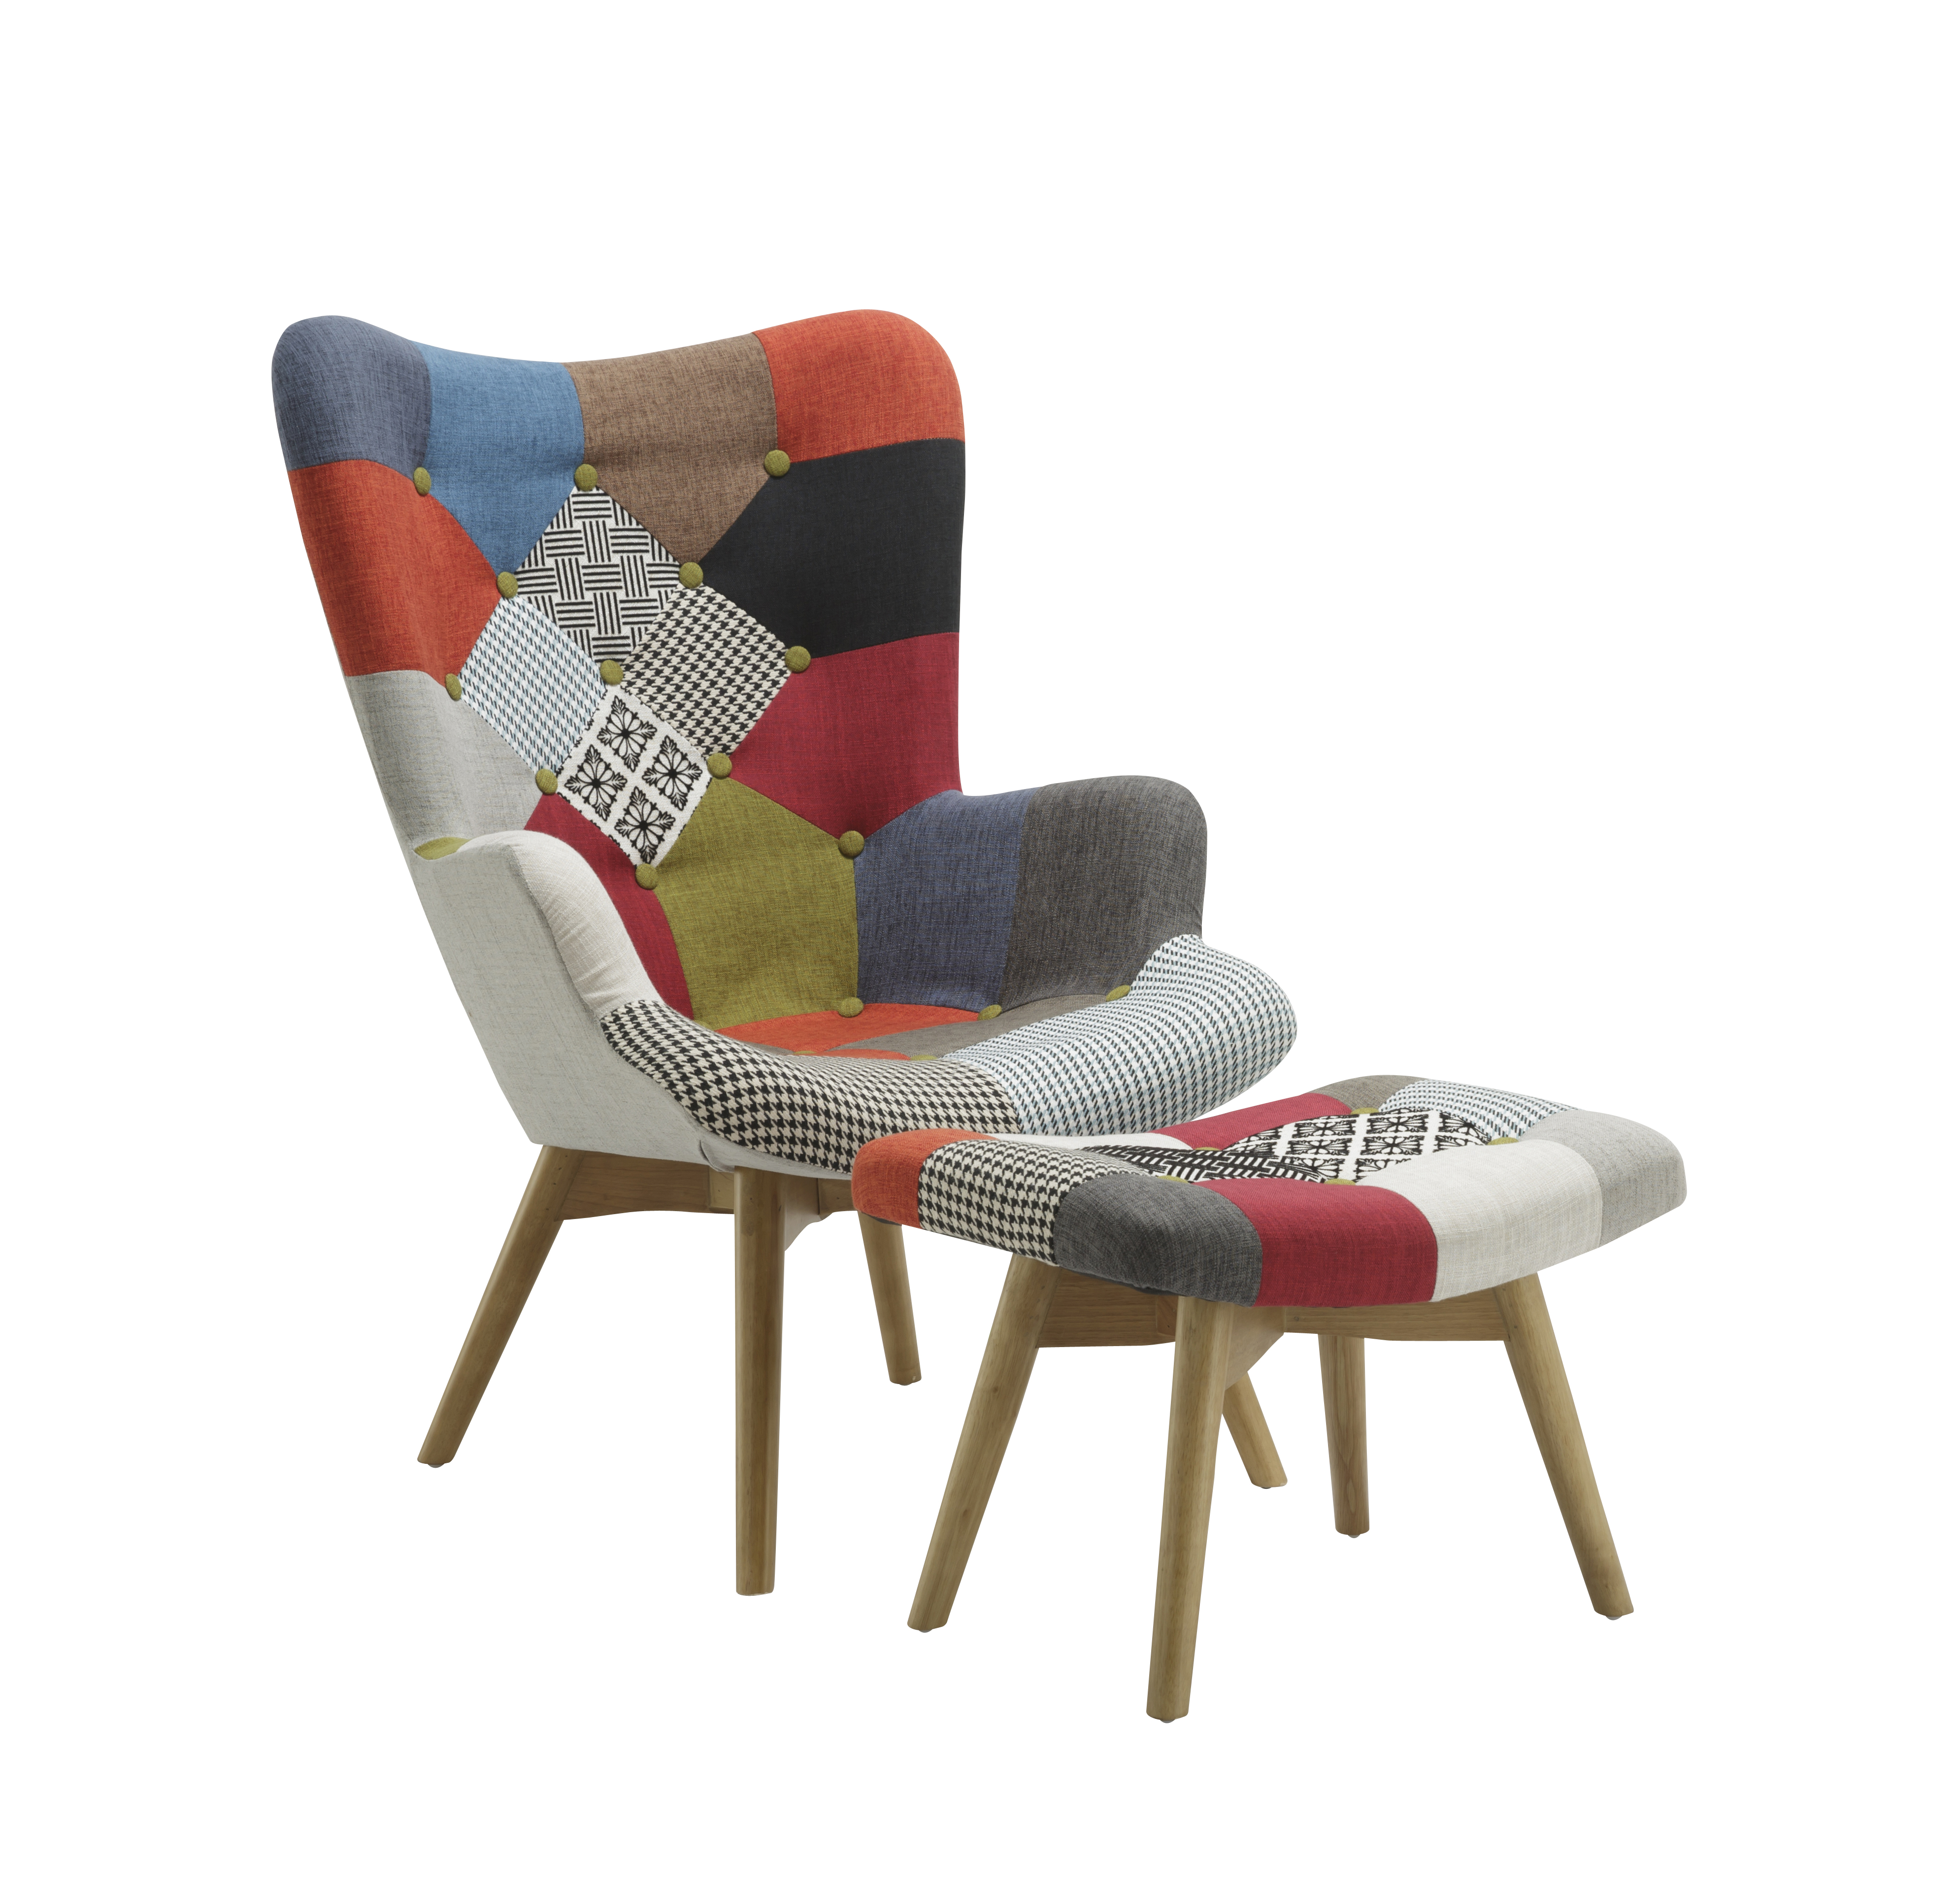 Patchwork Armchair & Stool Multicolour - Modern ...